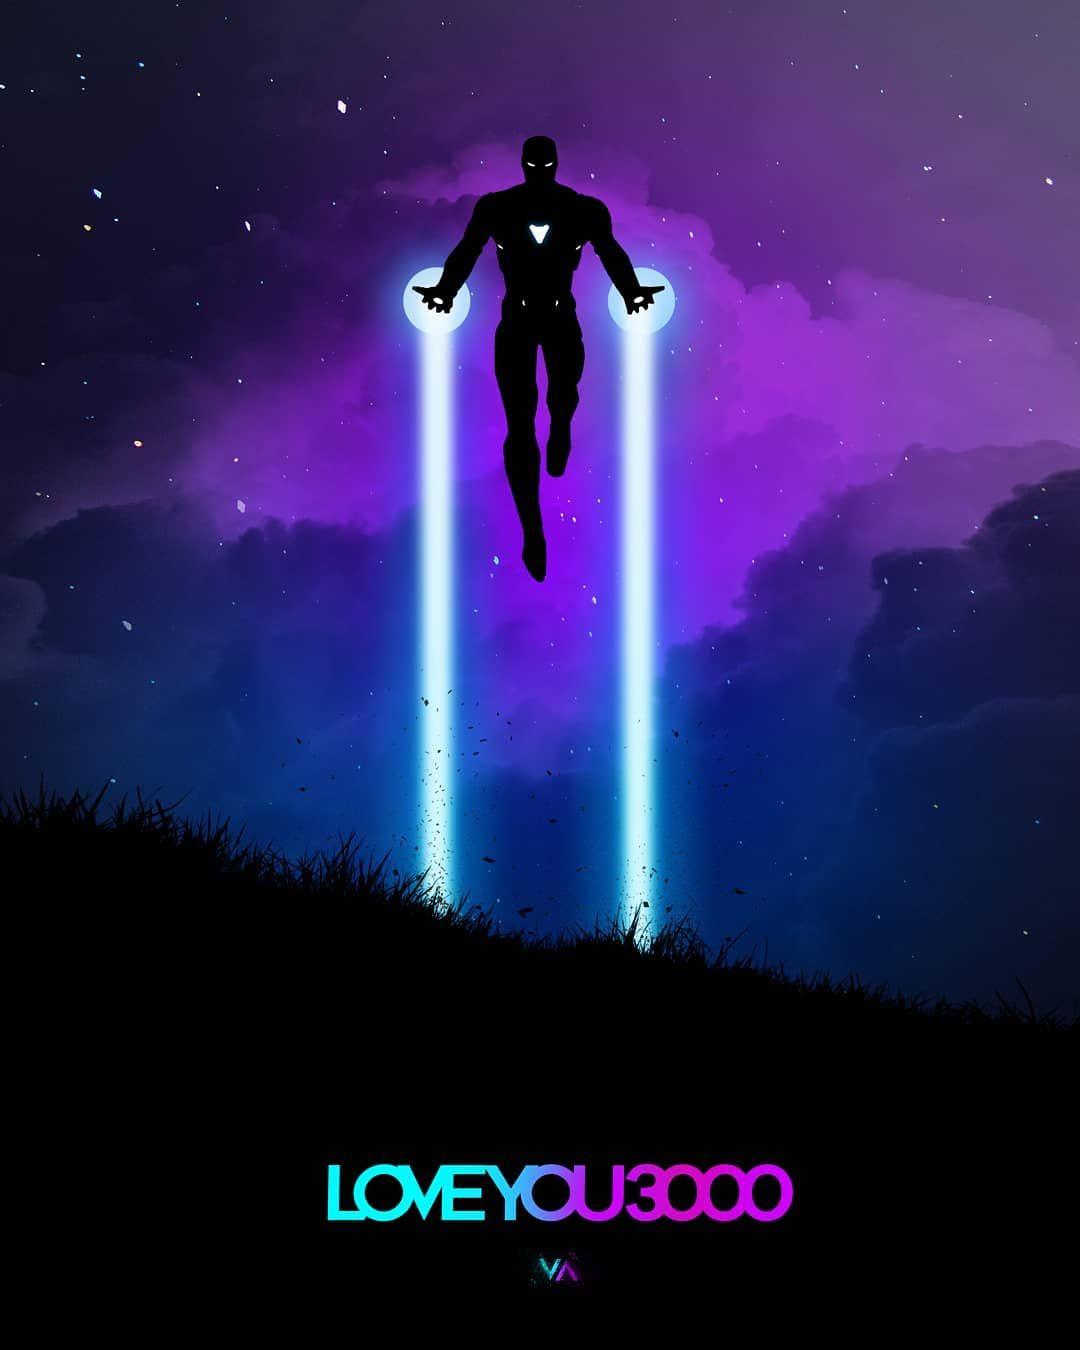 Love You 3000 Avengersendgame Ironman Robertdowneyjr Avengers Avengersendgame Marvel Iron Man Wallpaper Marvel Iron Man